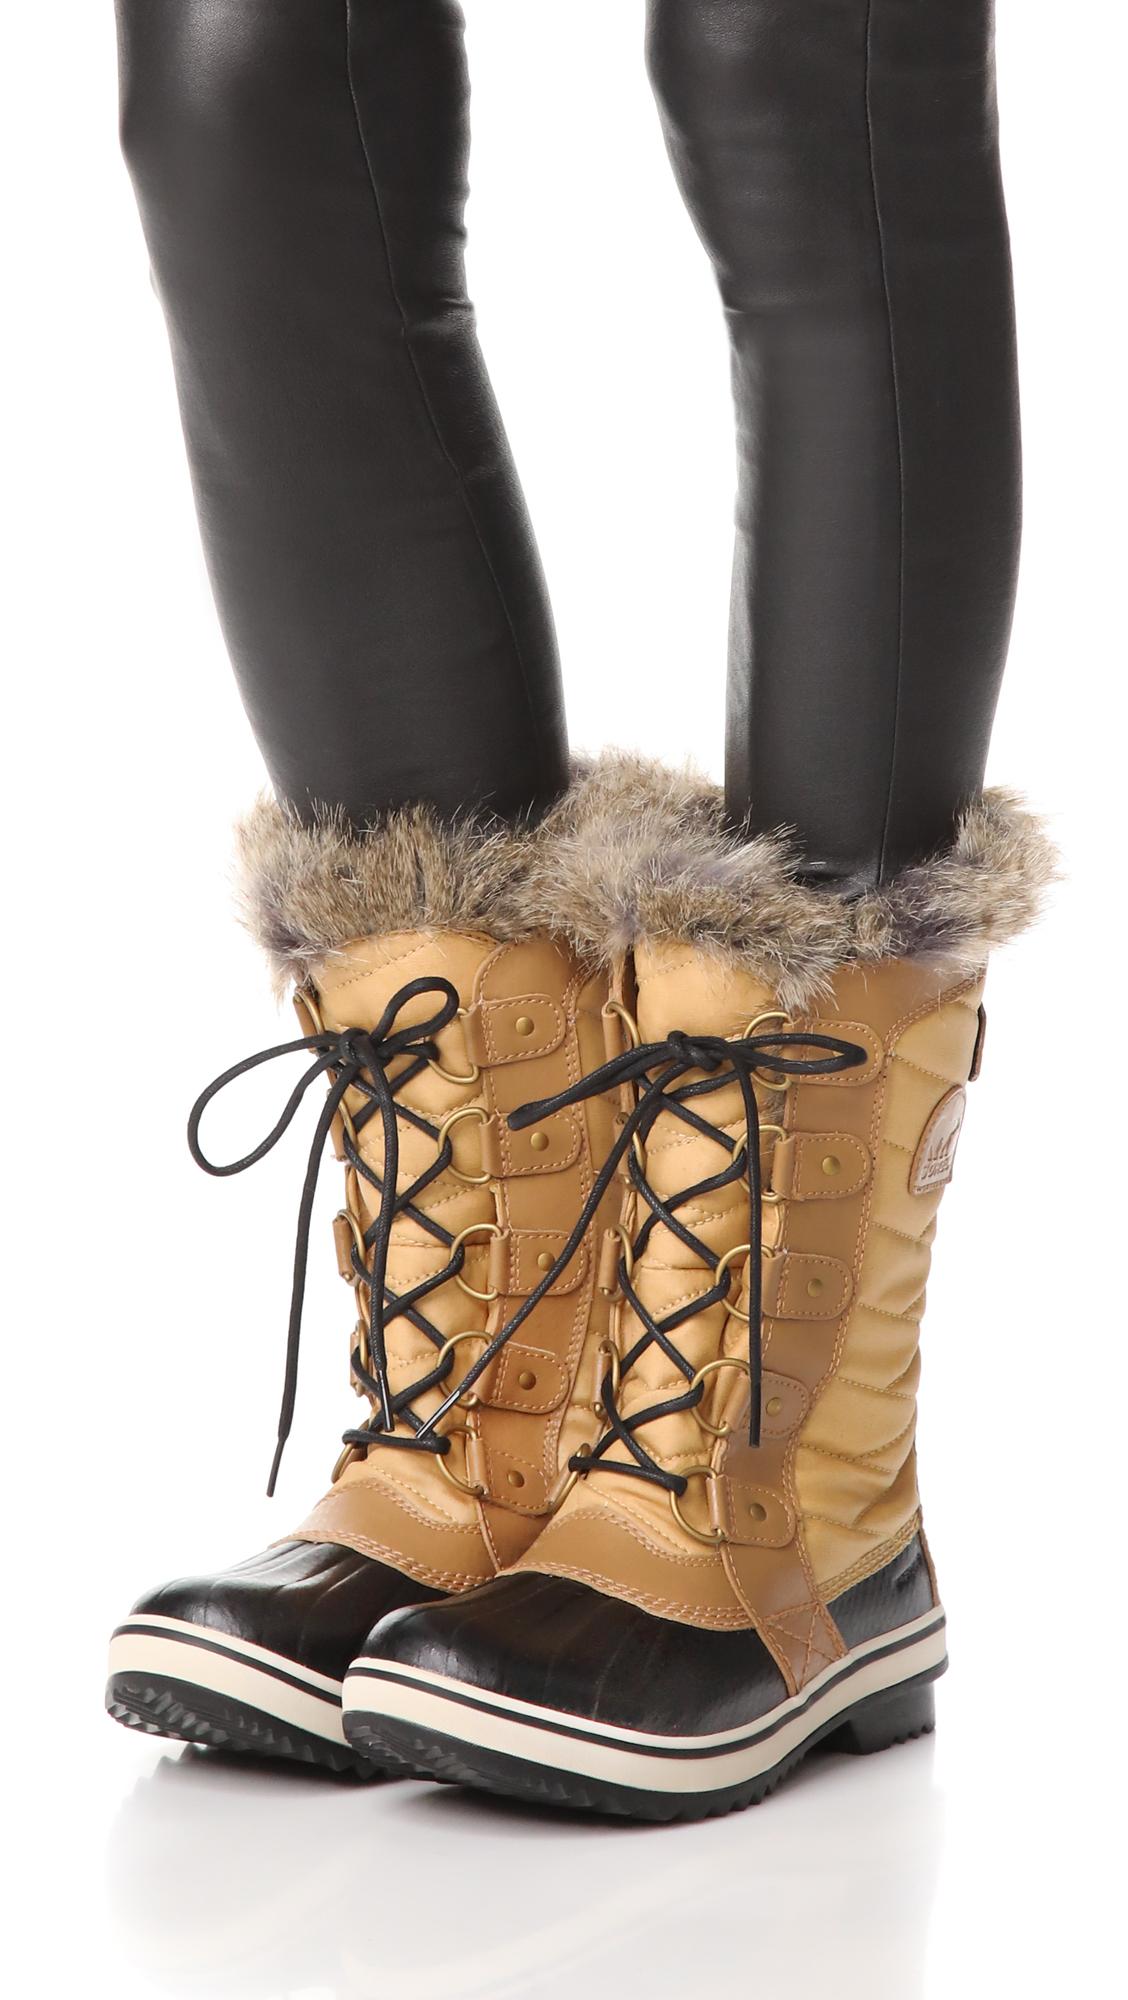 low priced 28f23 c5f4c Sorel Tofino II Boots   SHOPBOP